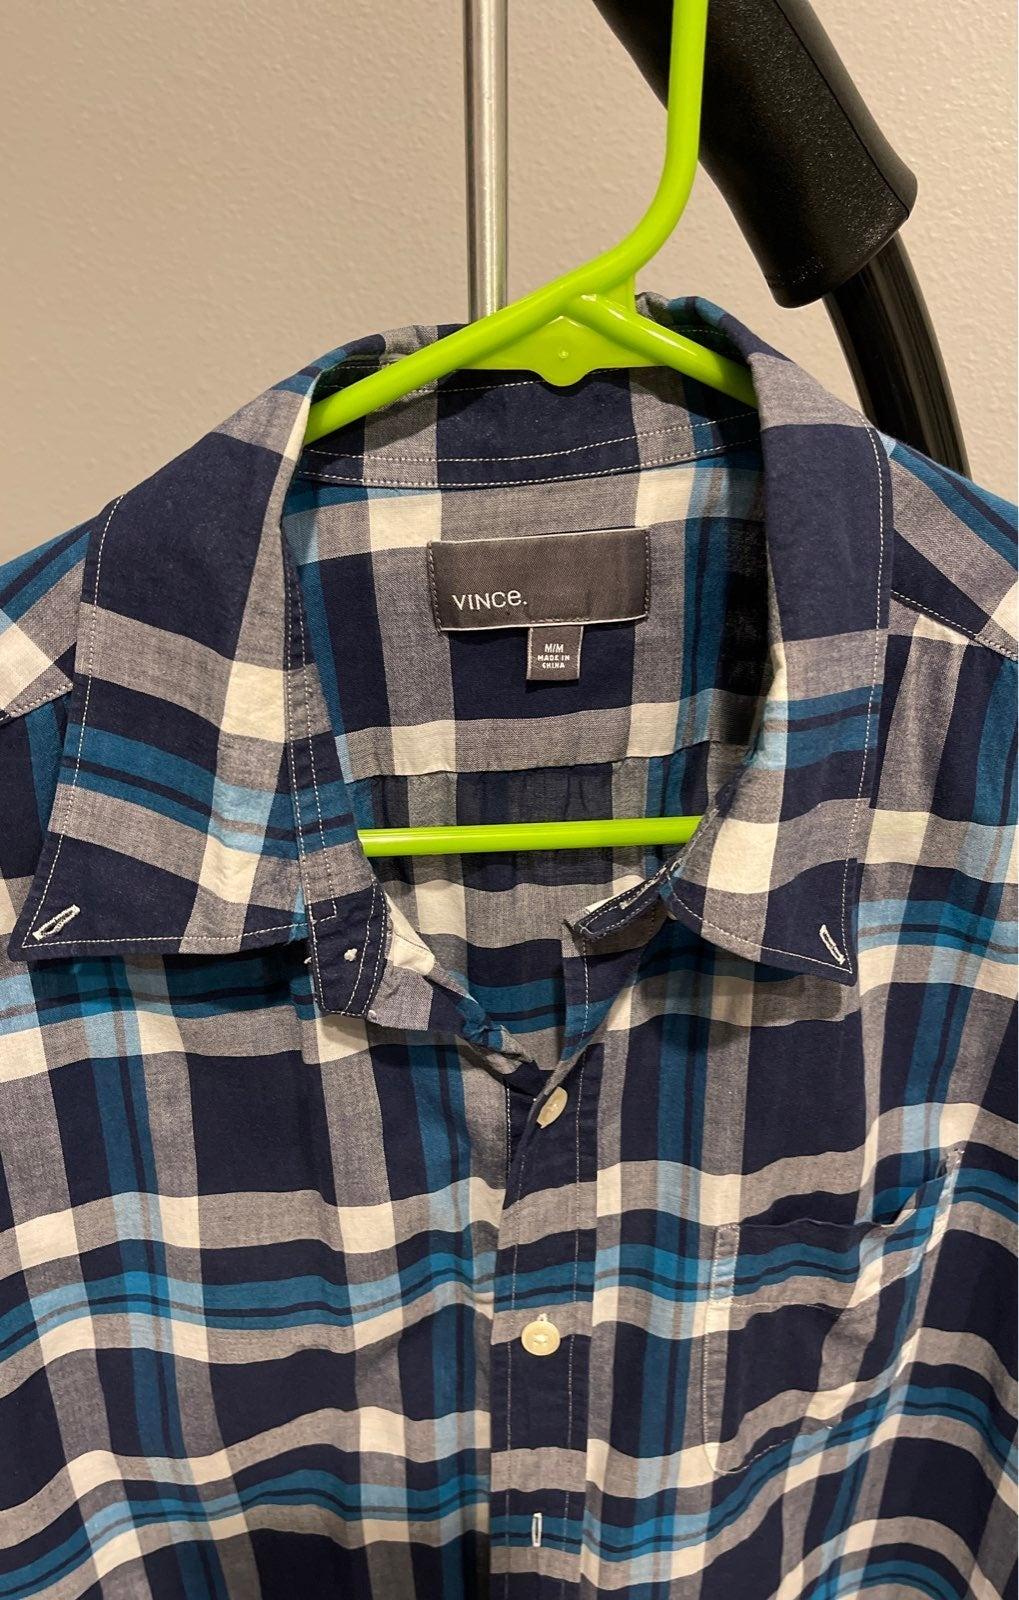 Vince Plaid Short Sleeve Shirt Size M